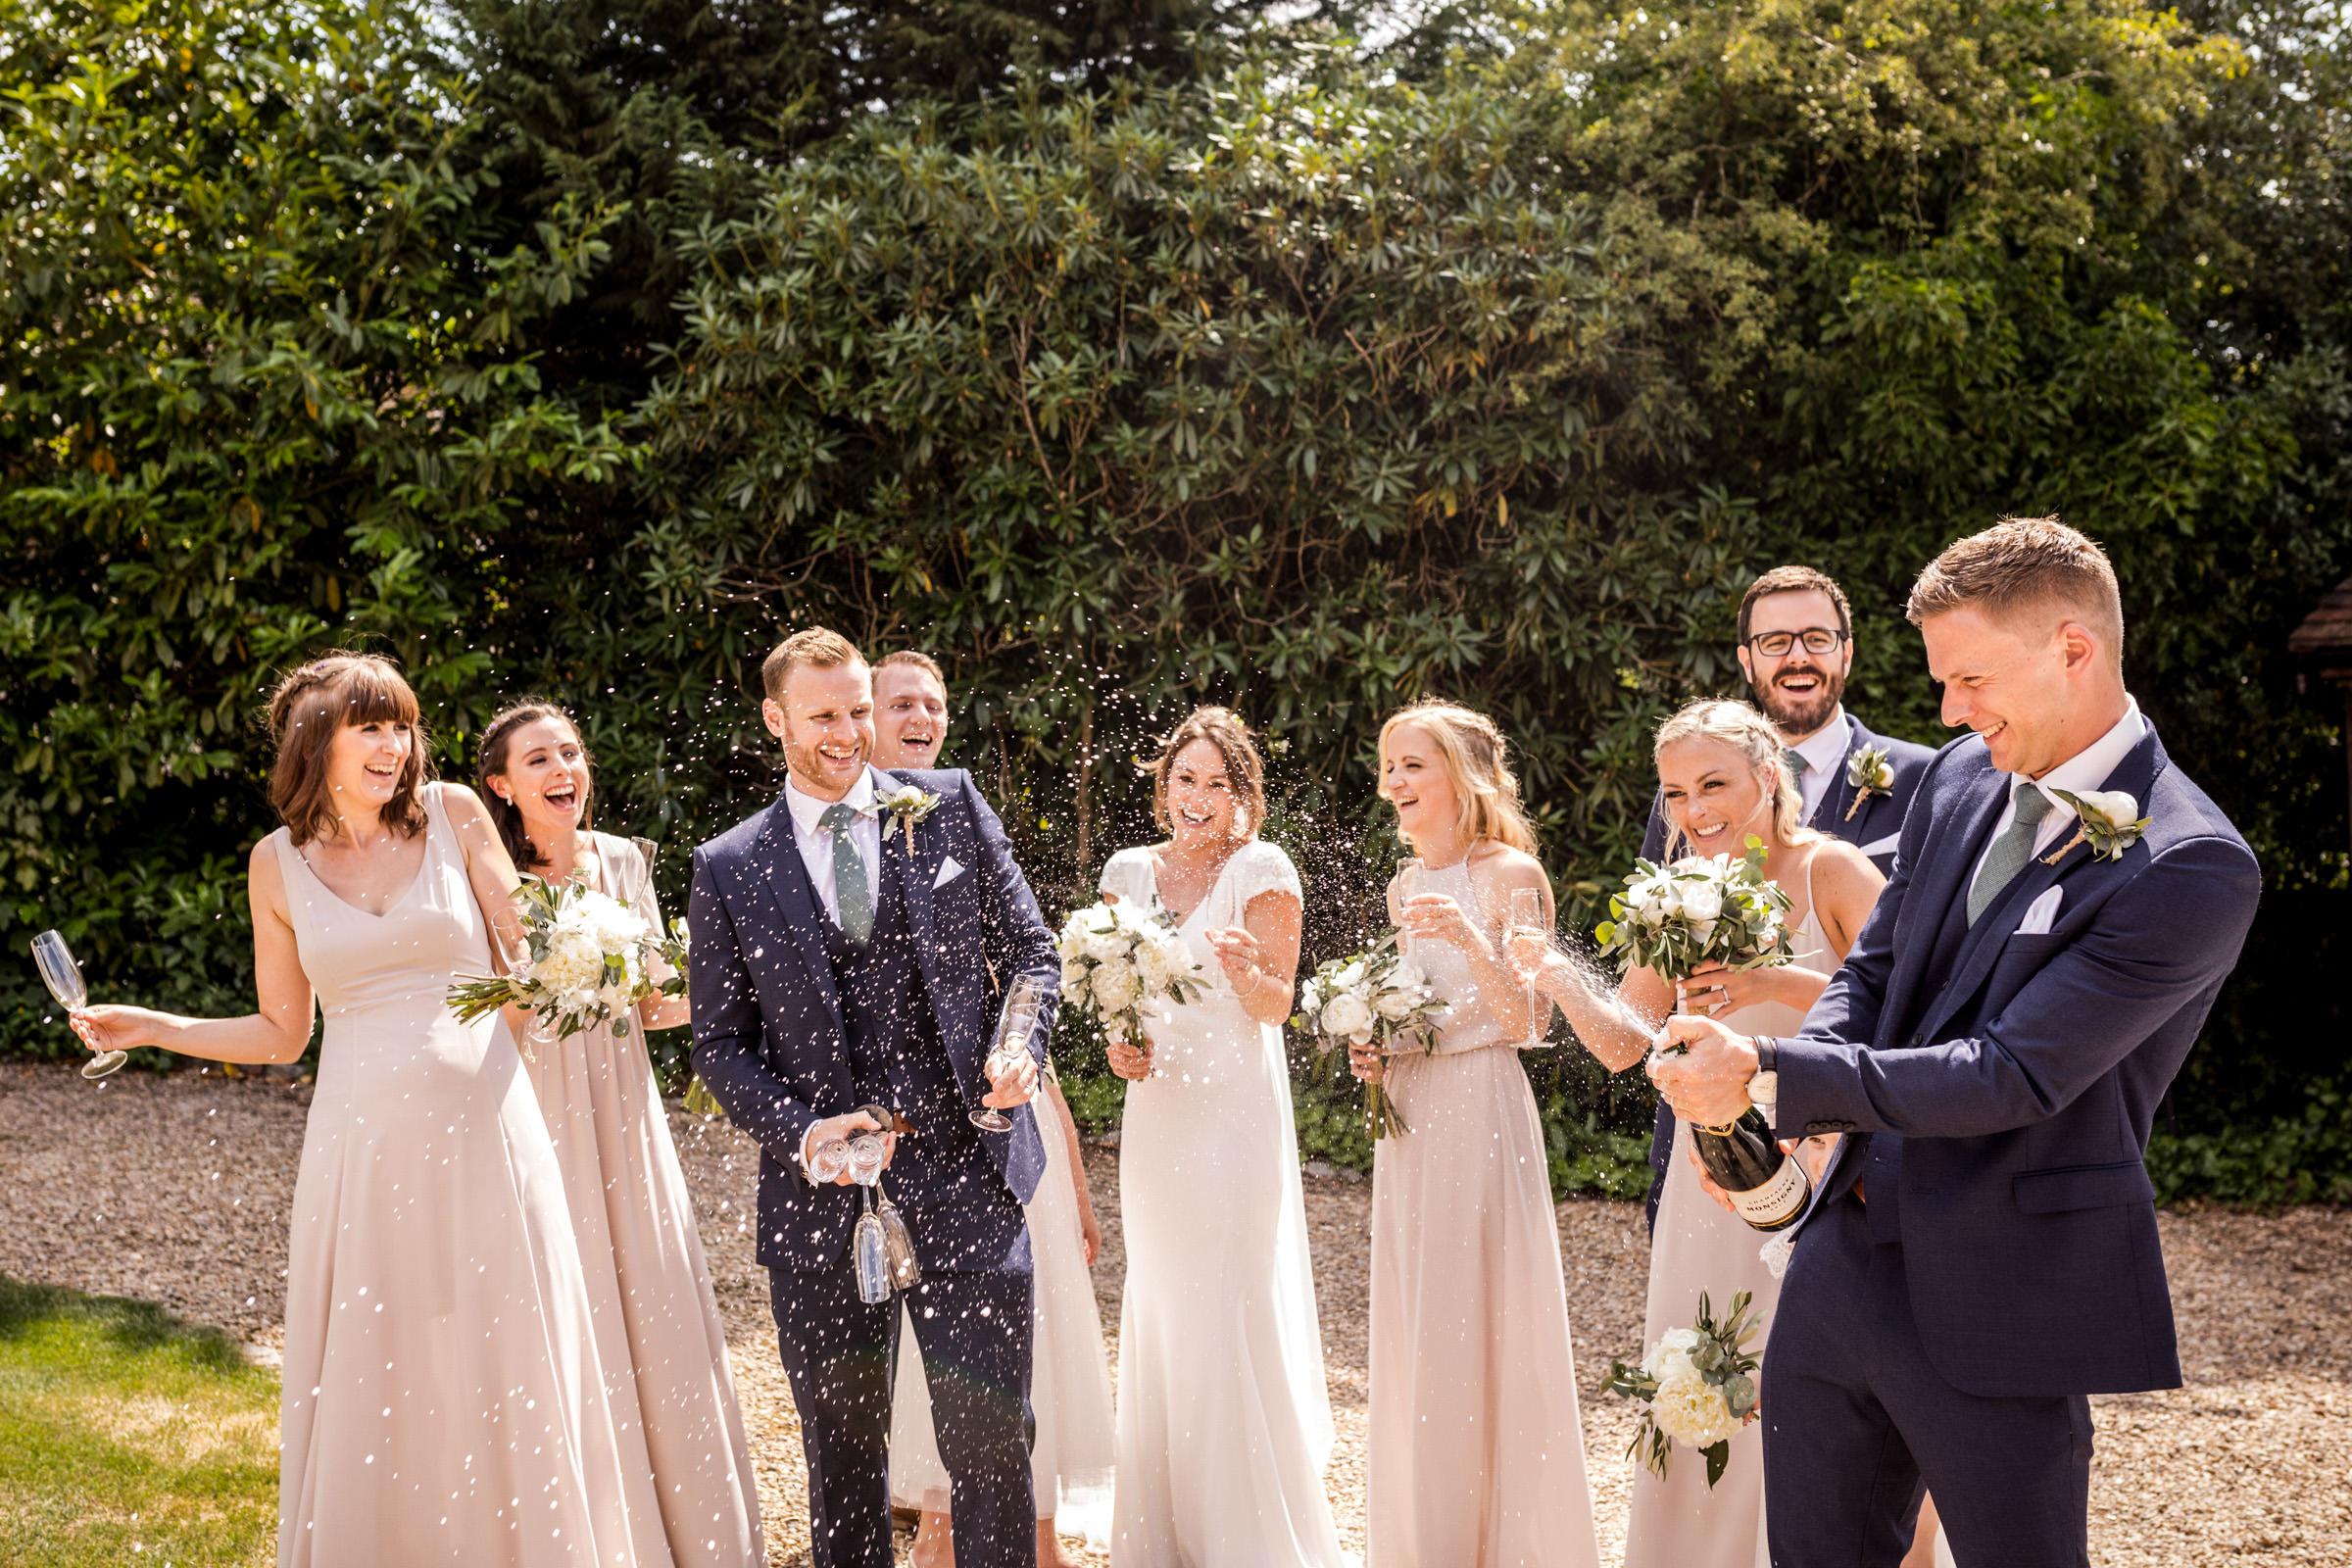 Wedding Photography in Ewshot Surrey 021.jpg